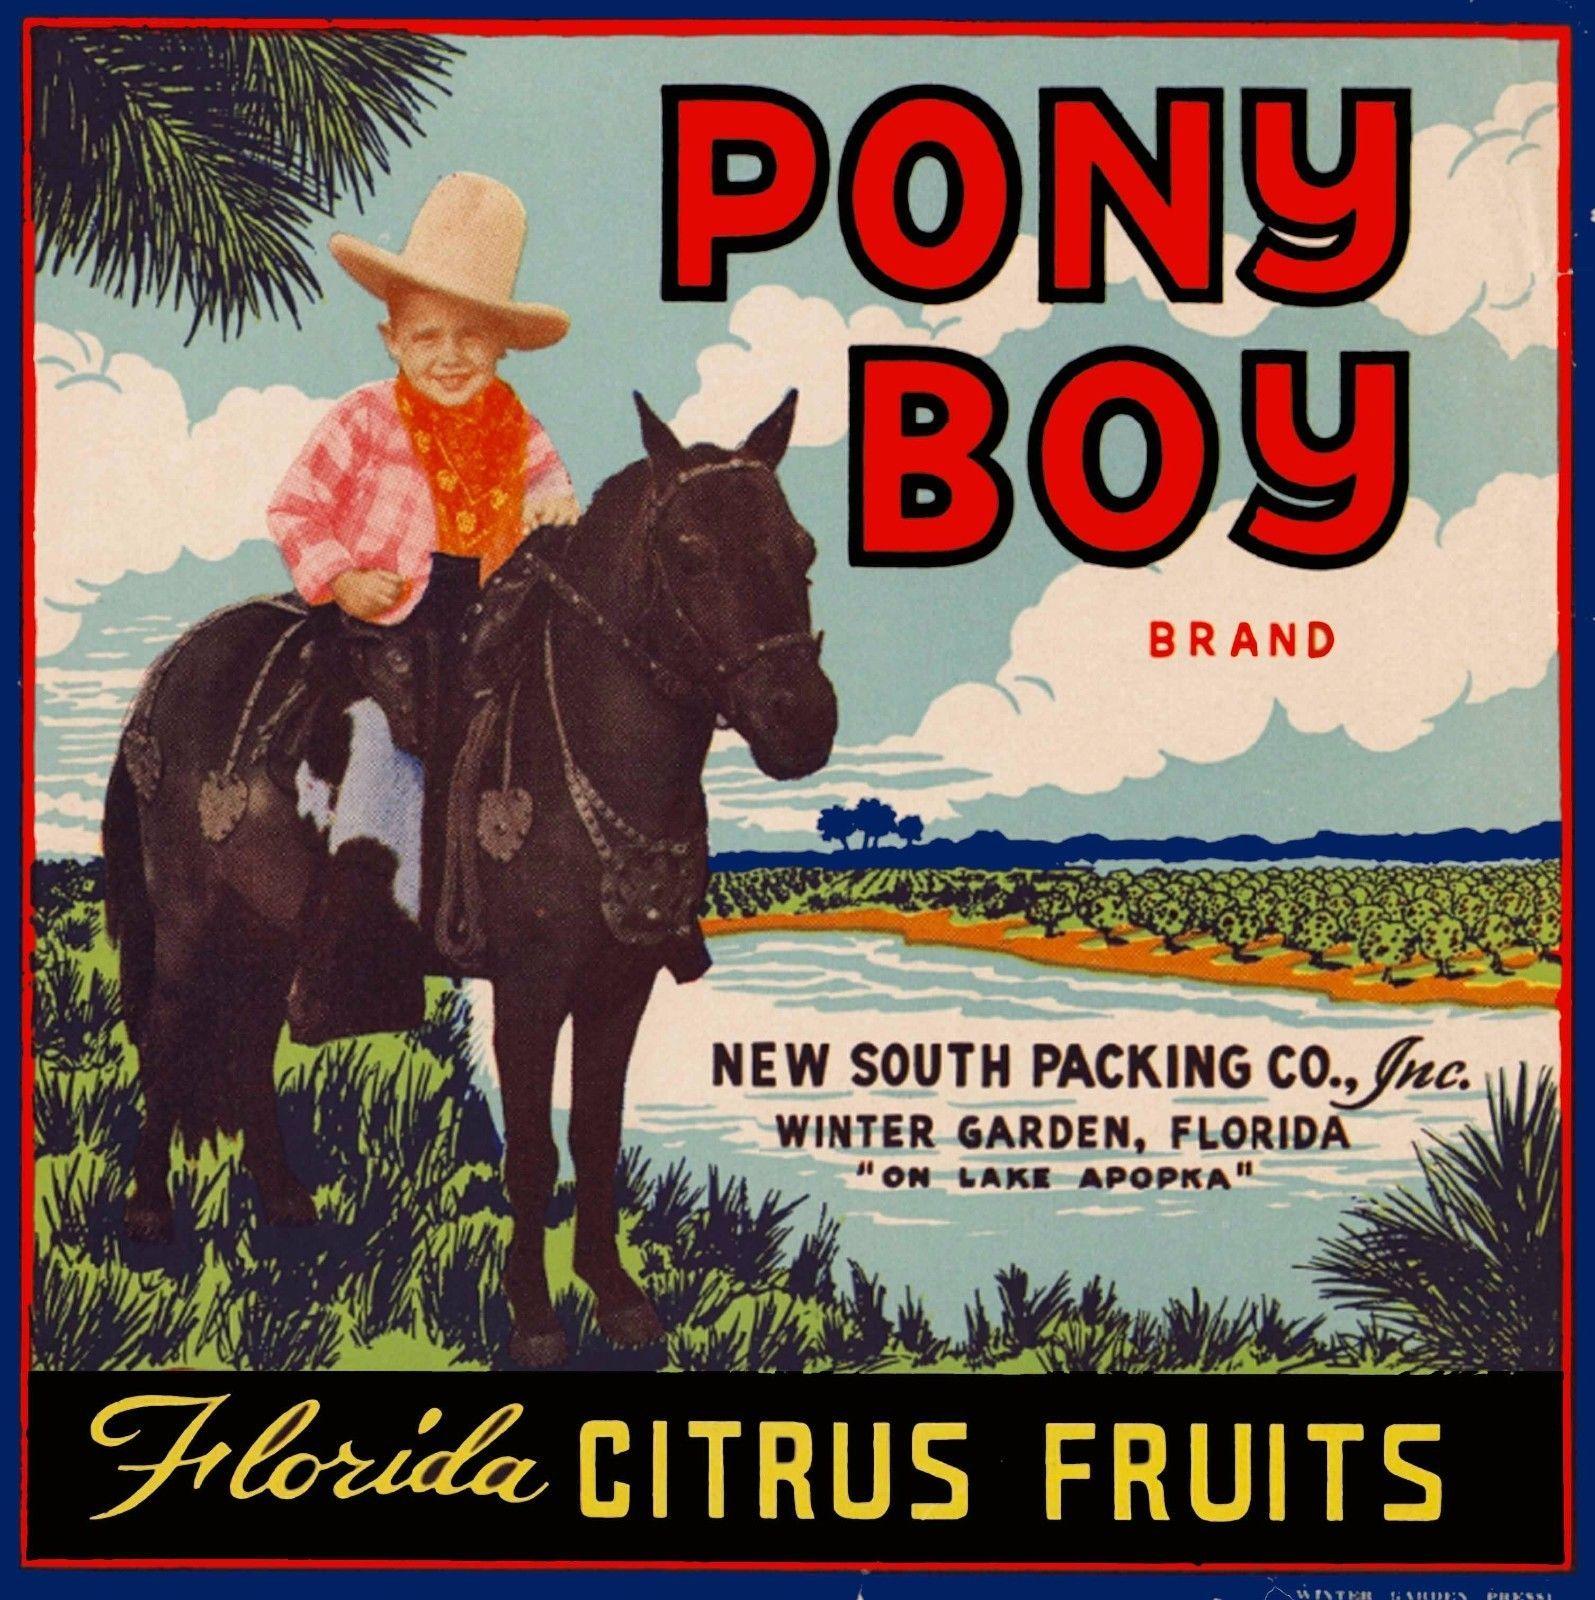 winter garden florida pony boy brand orange citrus fruit crate